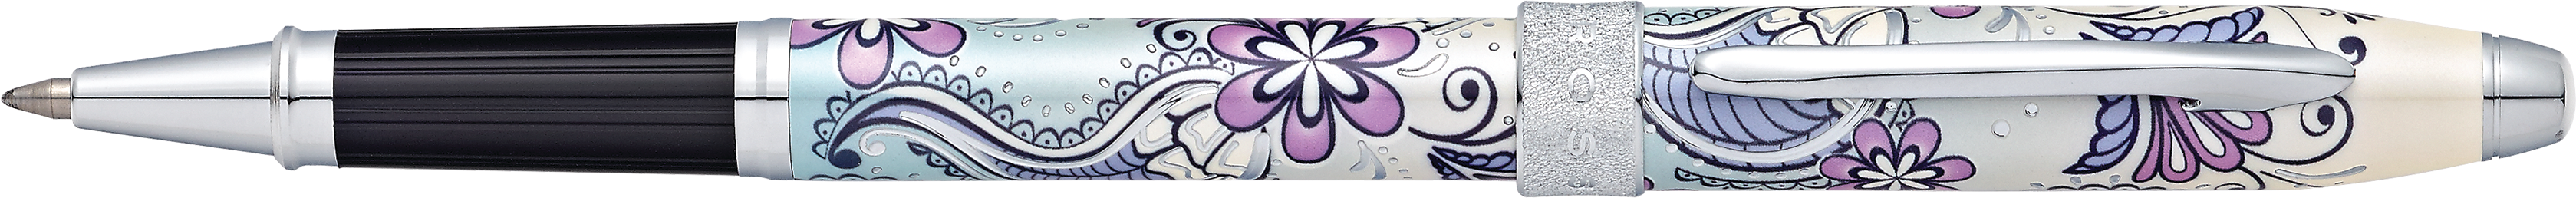 Botanica Purple Orchid Rollerball Pen